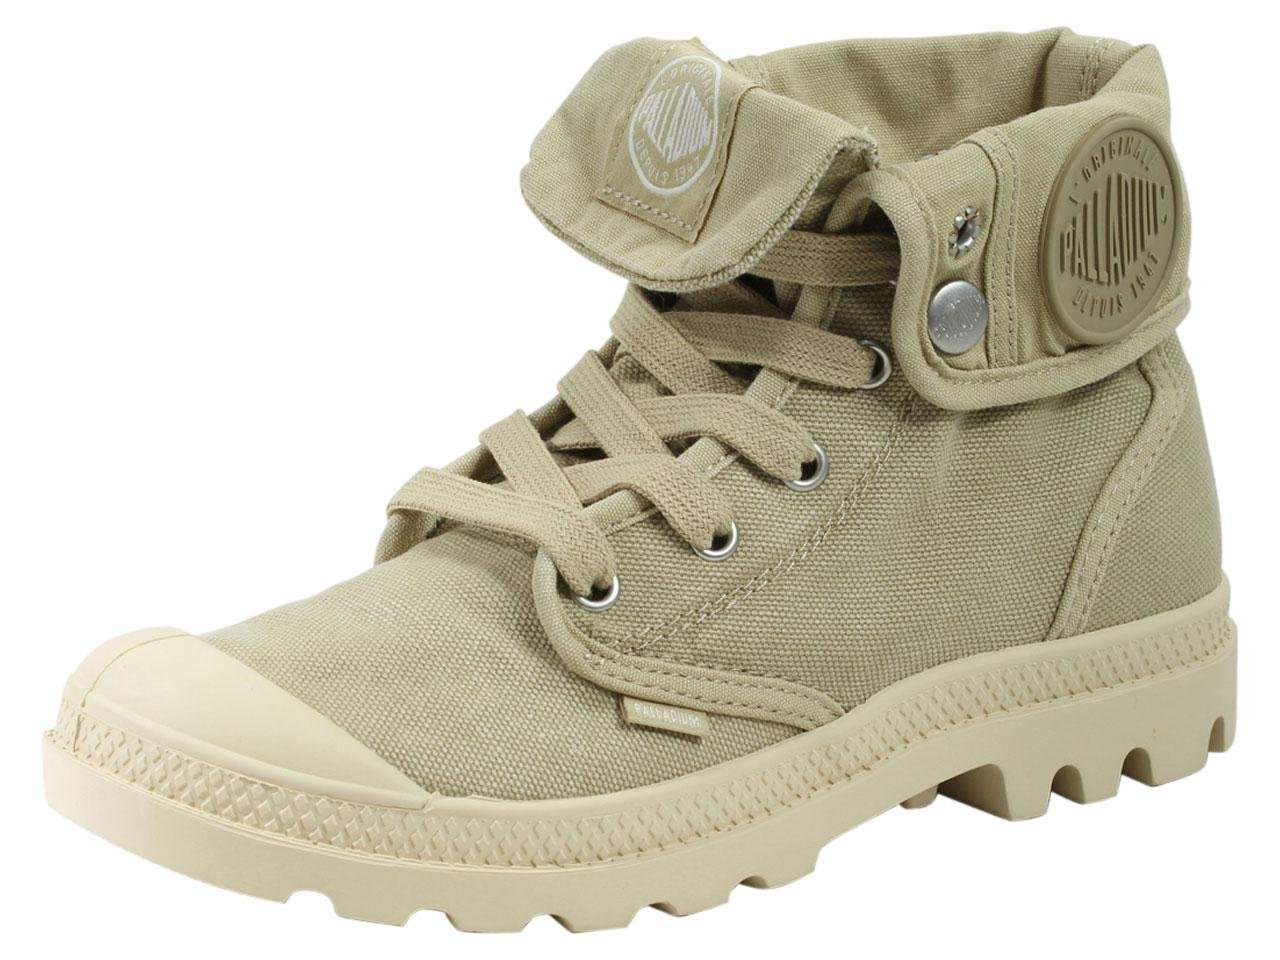 Palladium Women's Baggy Sahara/Ecru Boots Shoes Sz. 6